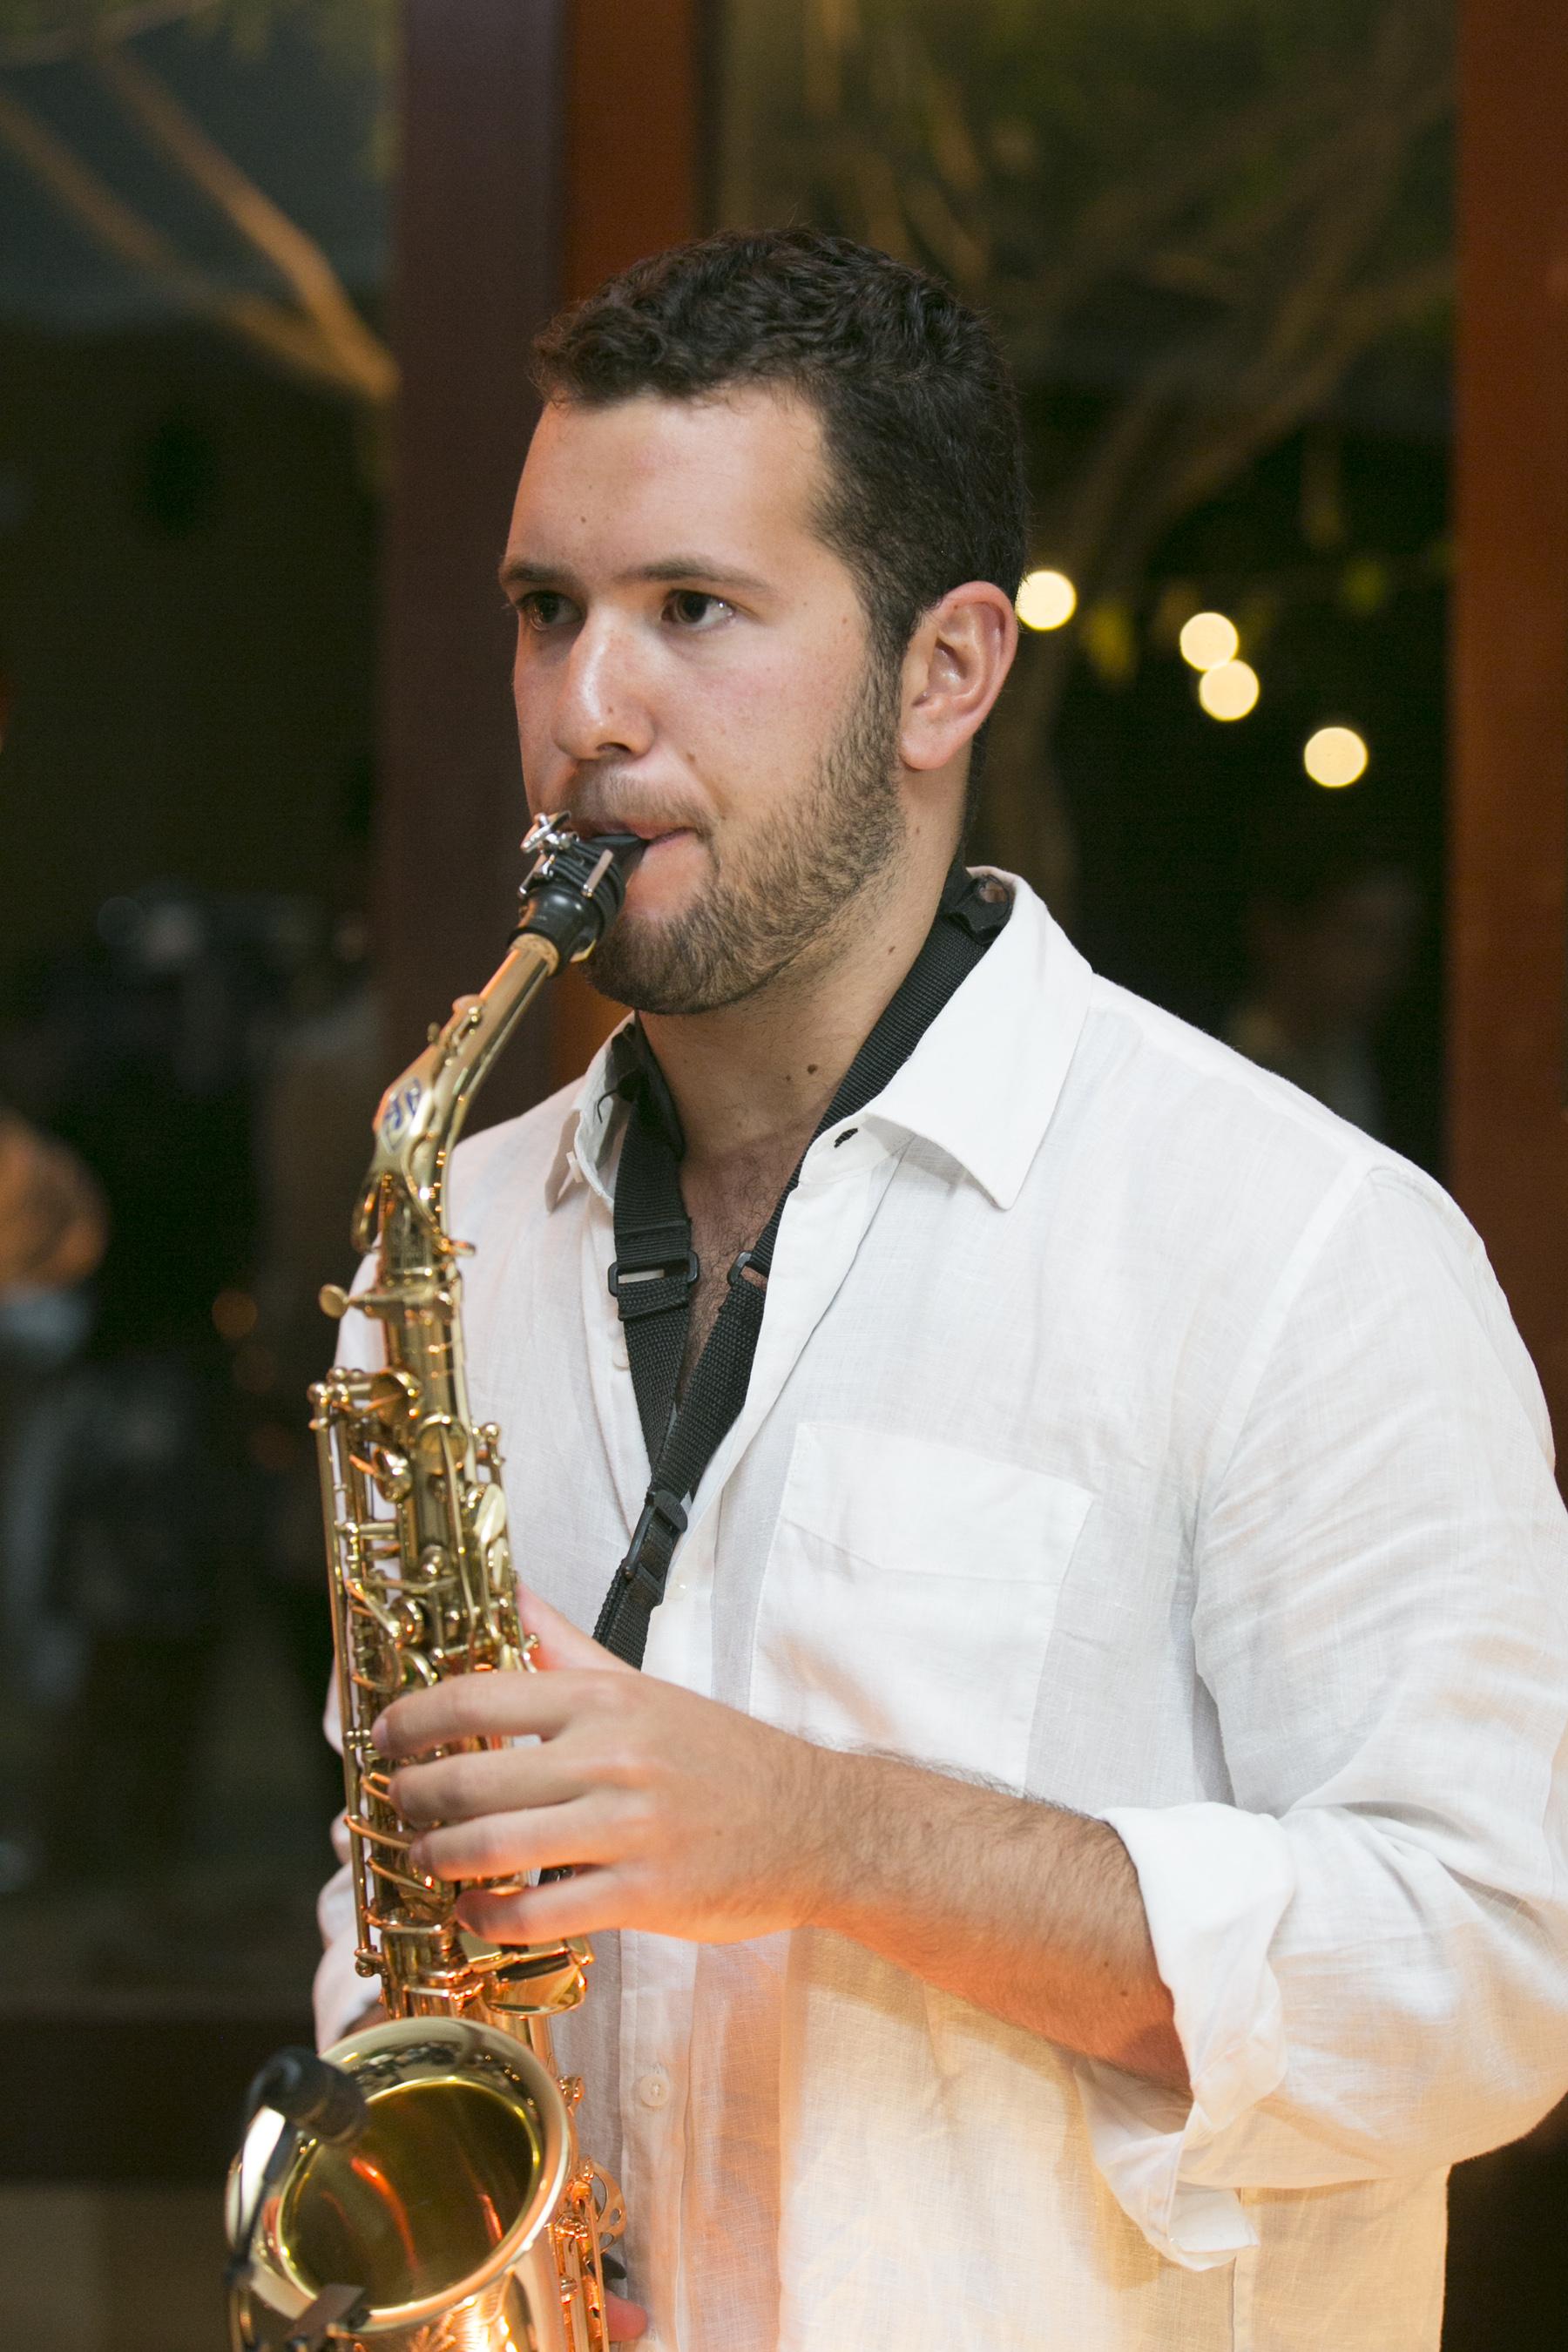 Sydney jazz music